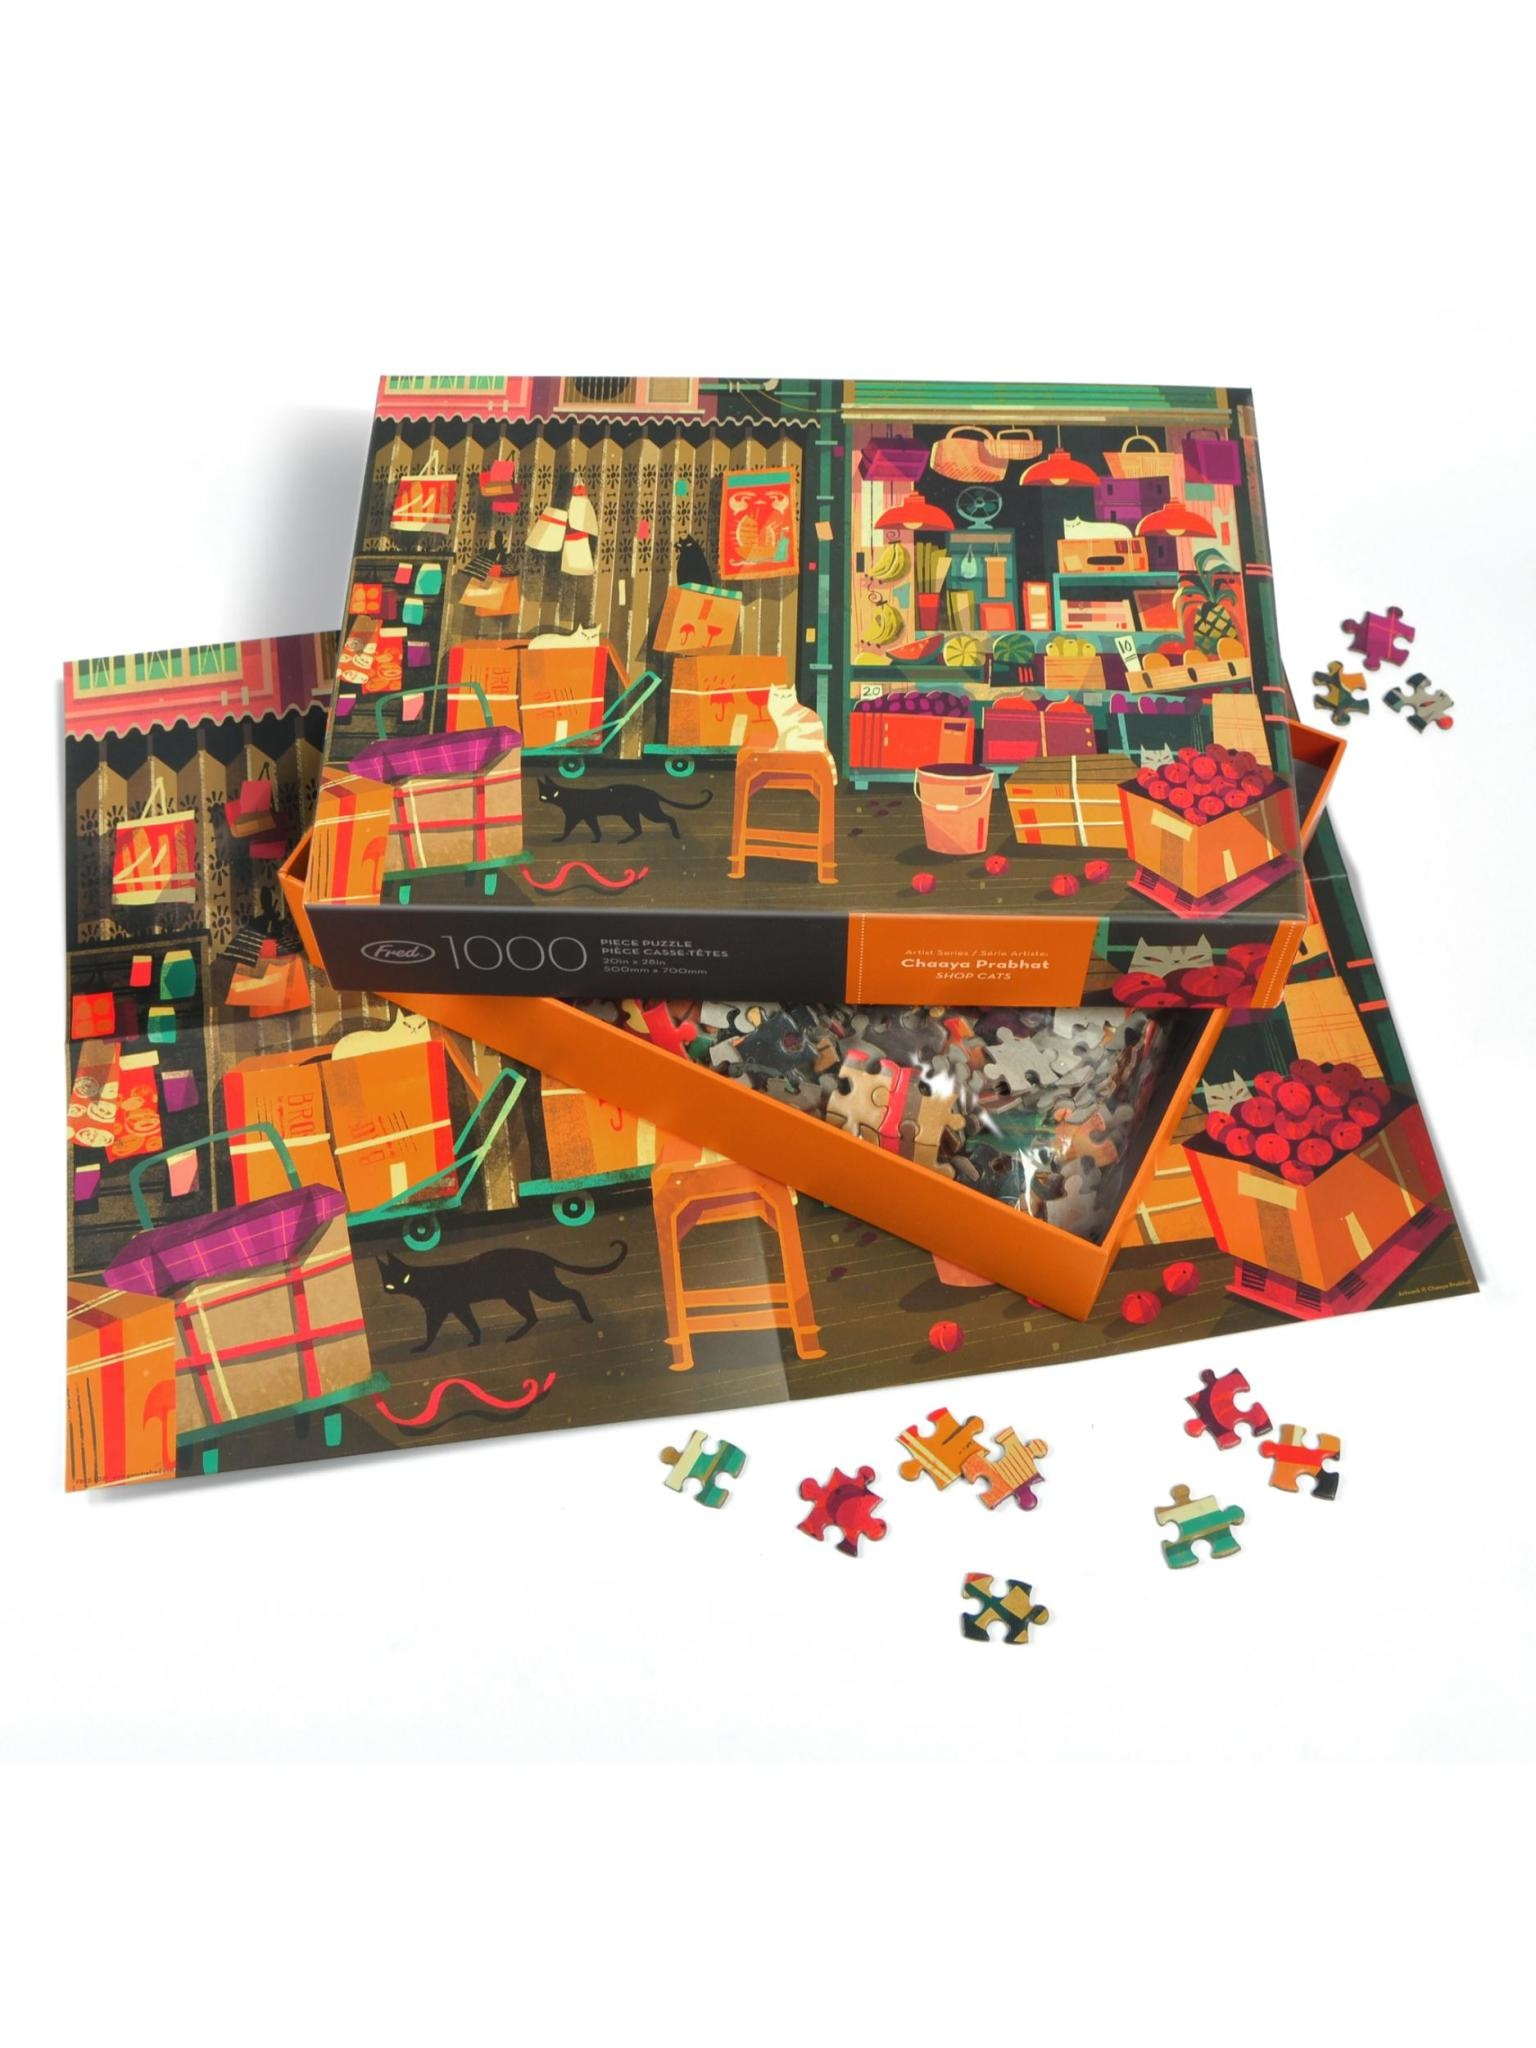 Fred Shop Cats 1000 Piece Puzzle